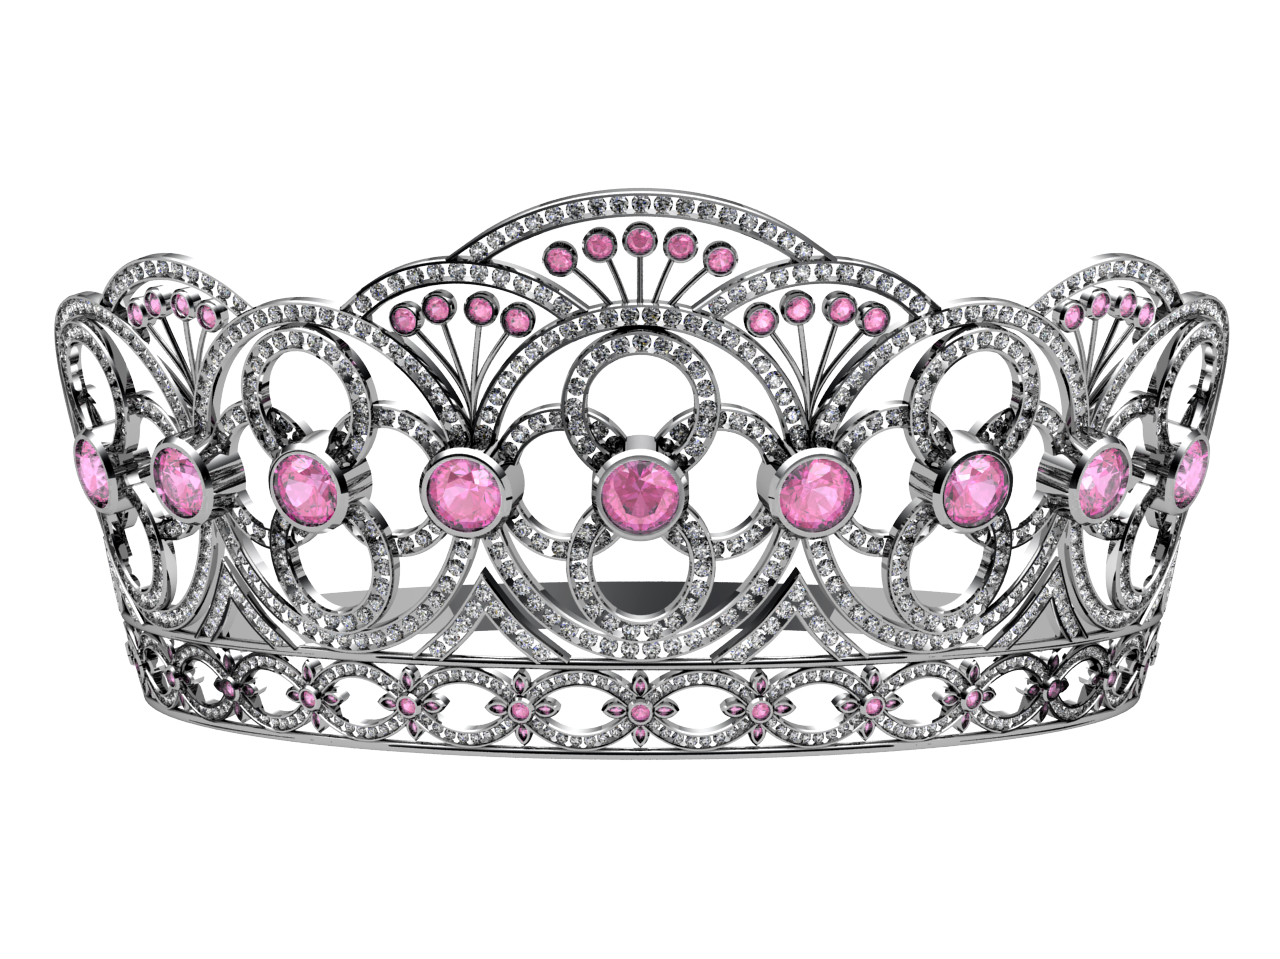 Download png Crown image free - PNG Crown Princess